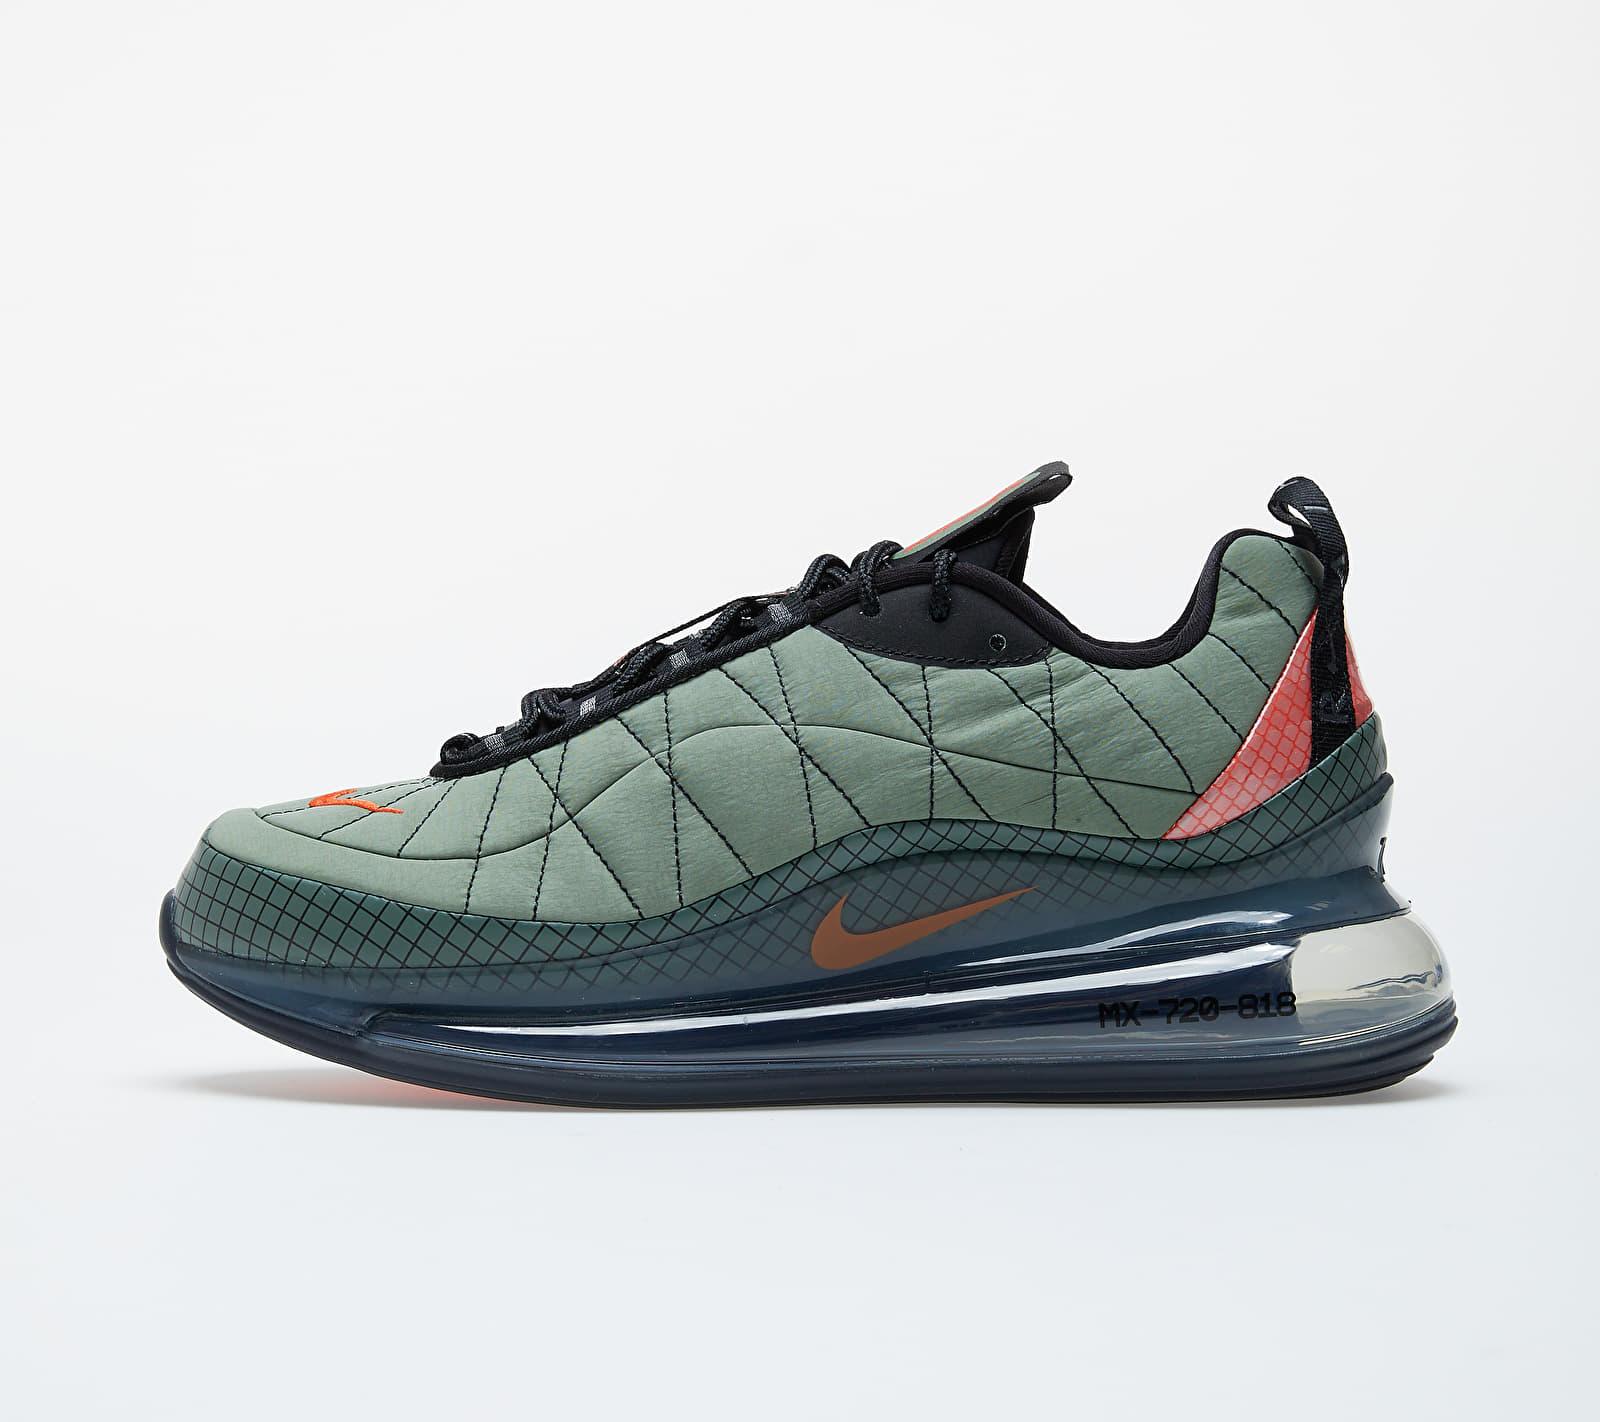 Nike Mx-720-818 Jade Stone/ Team Orange-Juniper Fog-Black CI3871-300